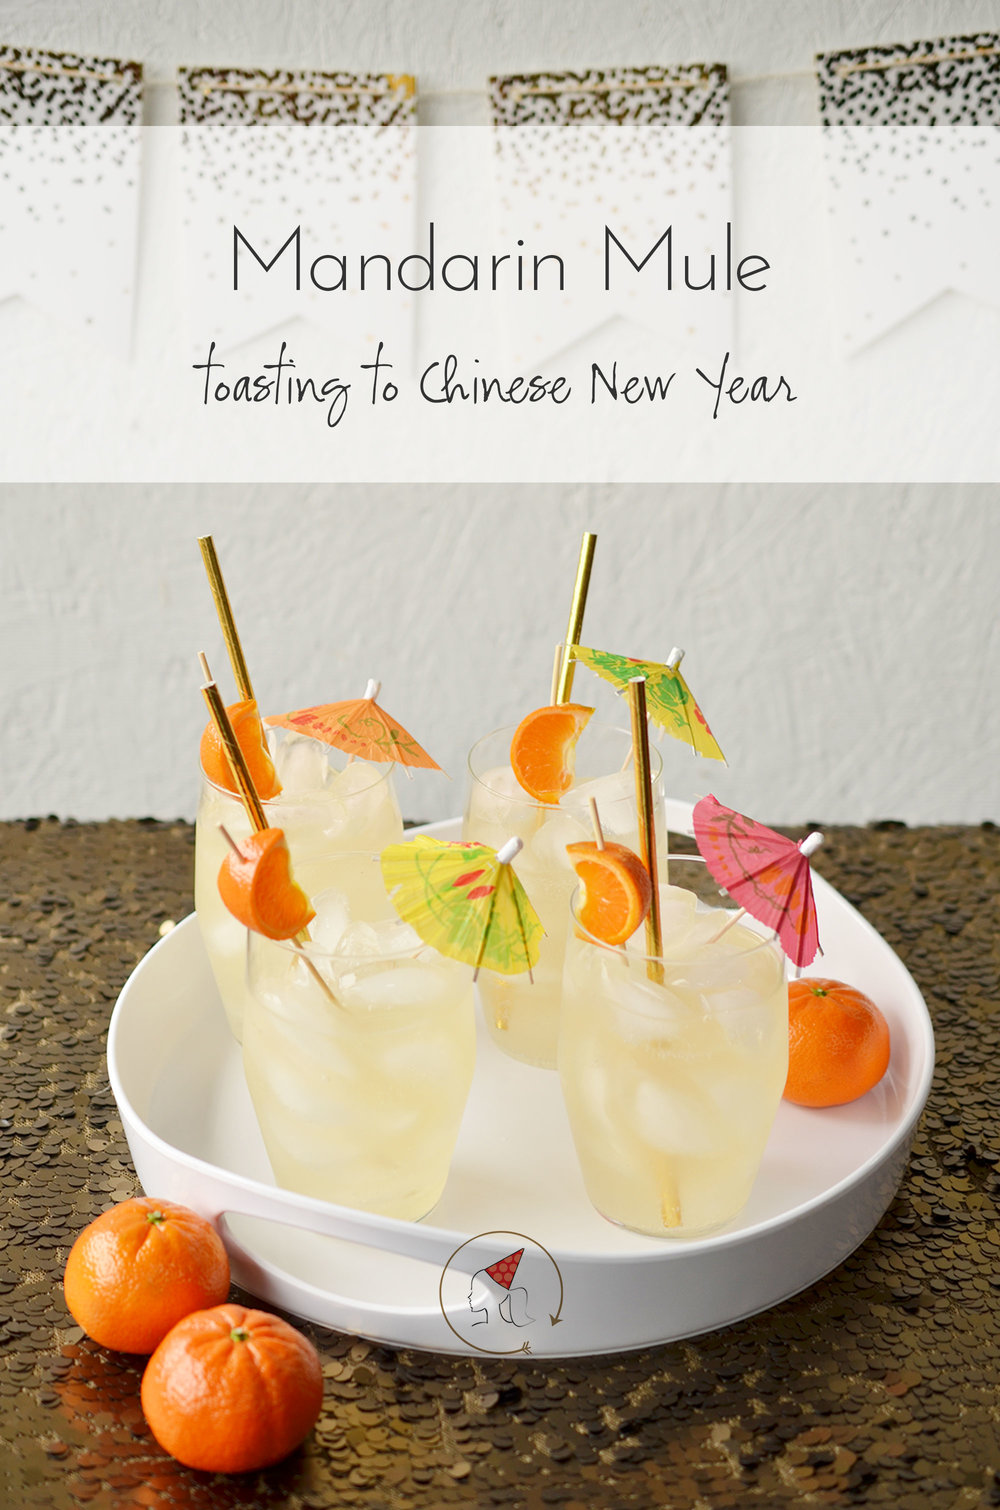 Ali Hedin | Mandarin Mule for Chinese New Year